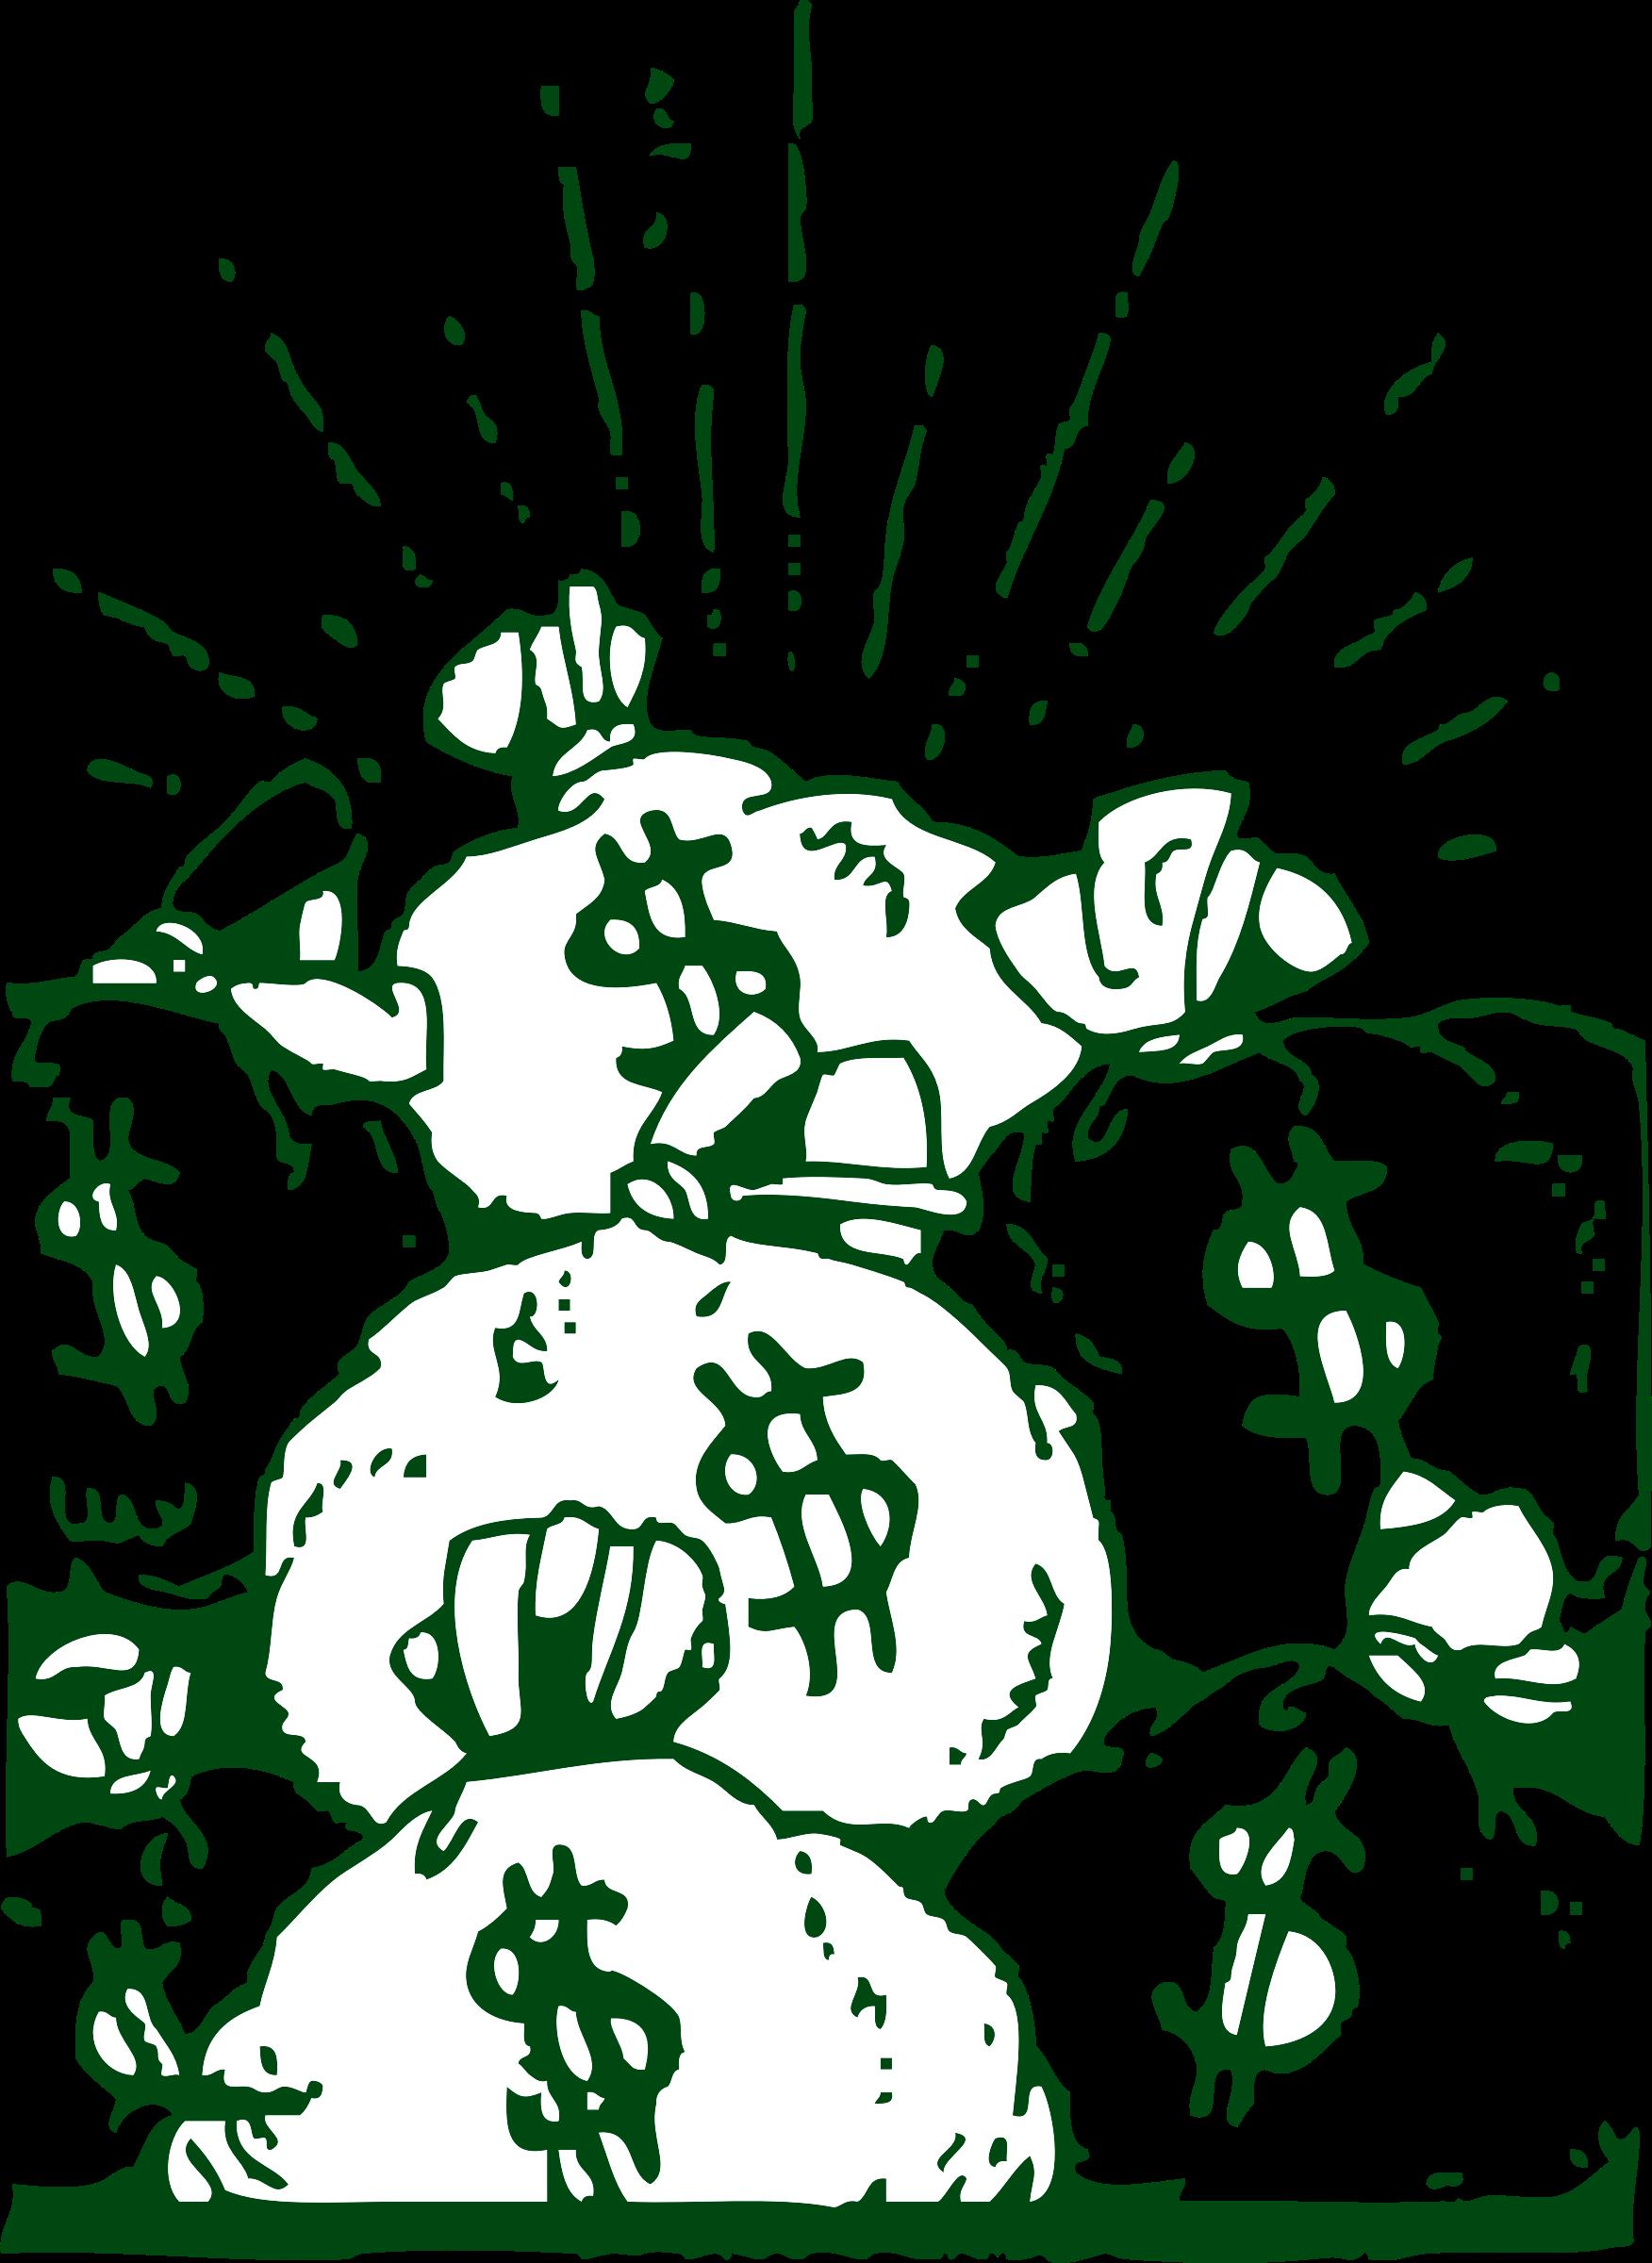 Design clipart money. Bags big image png